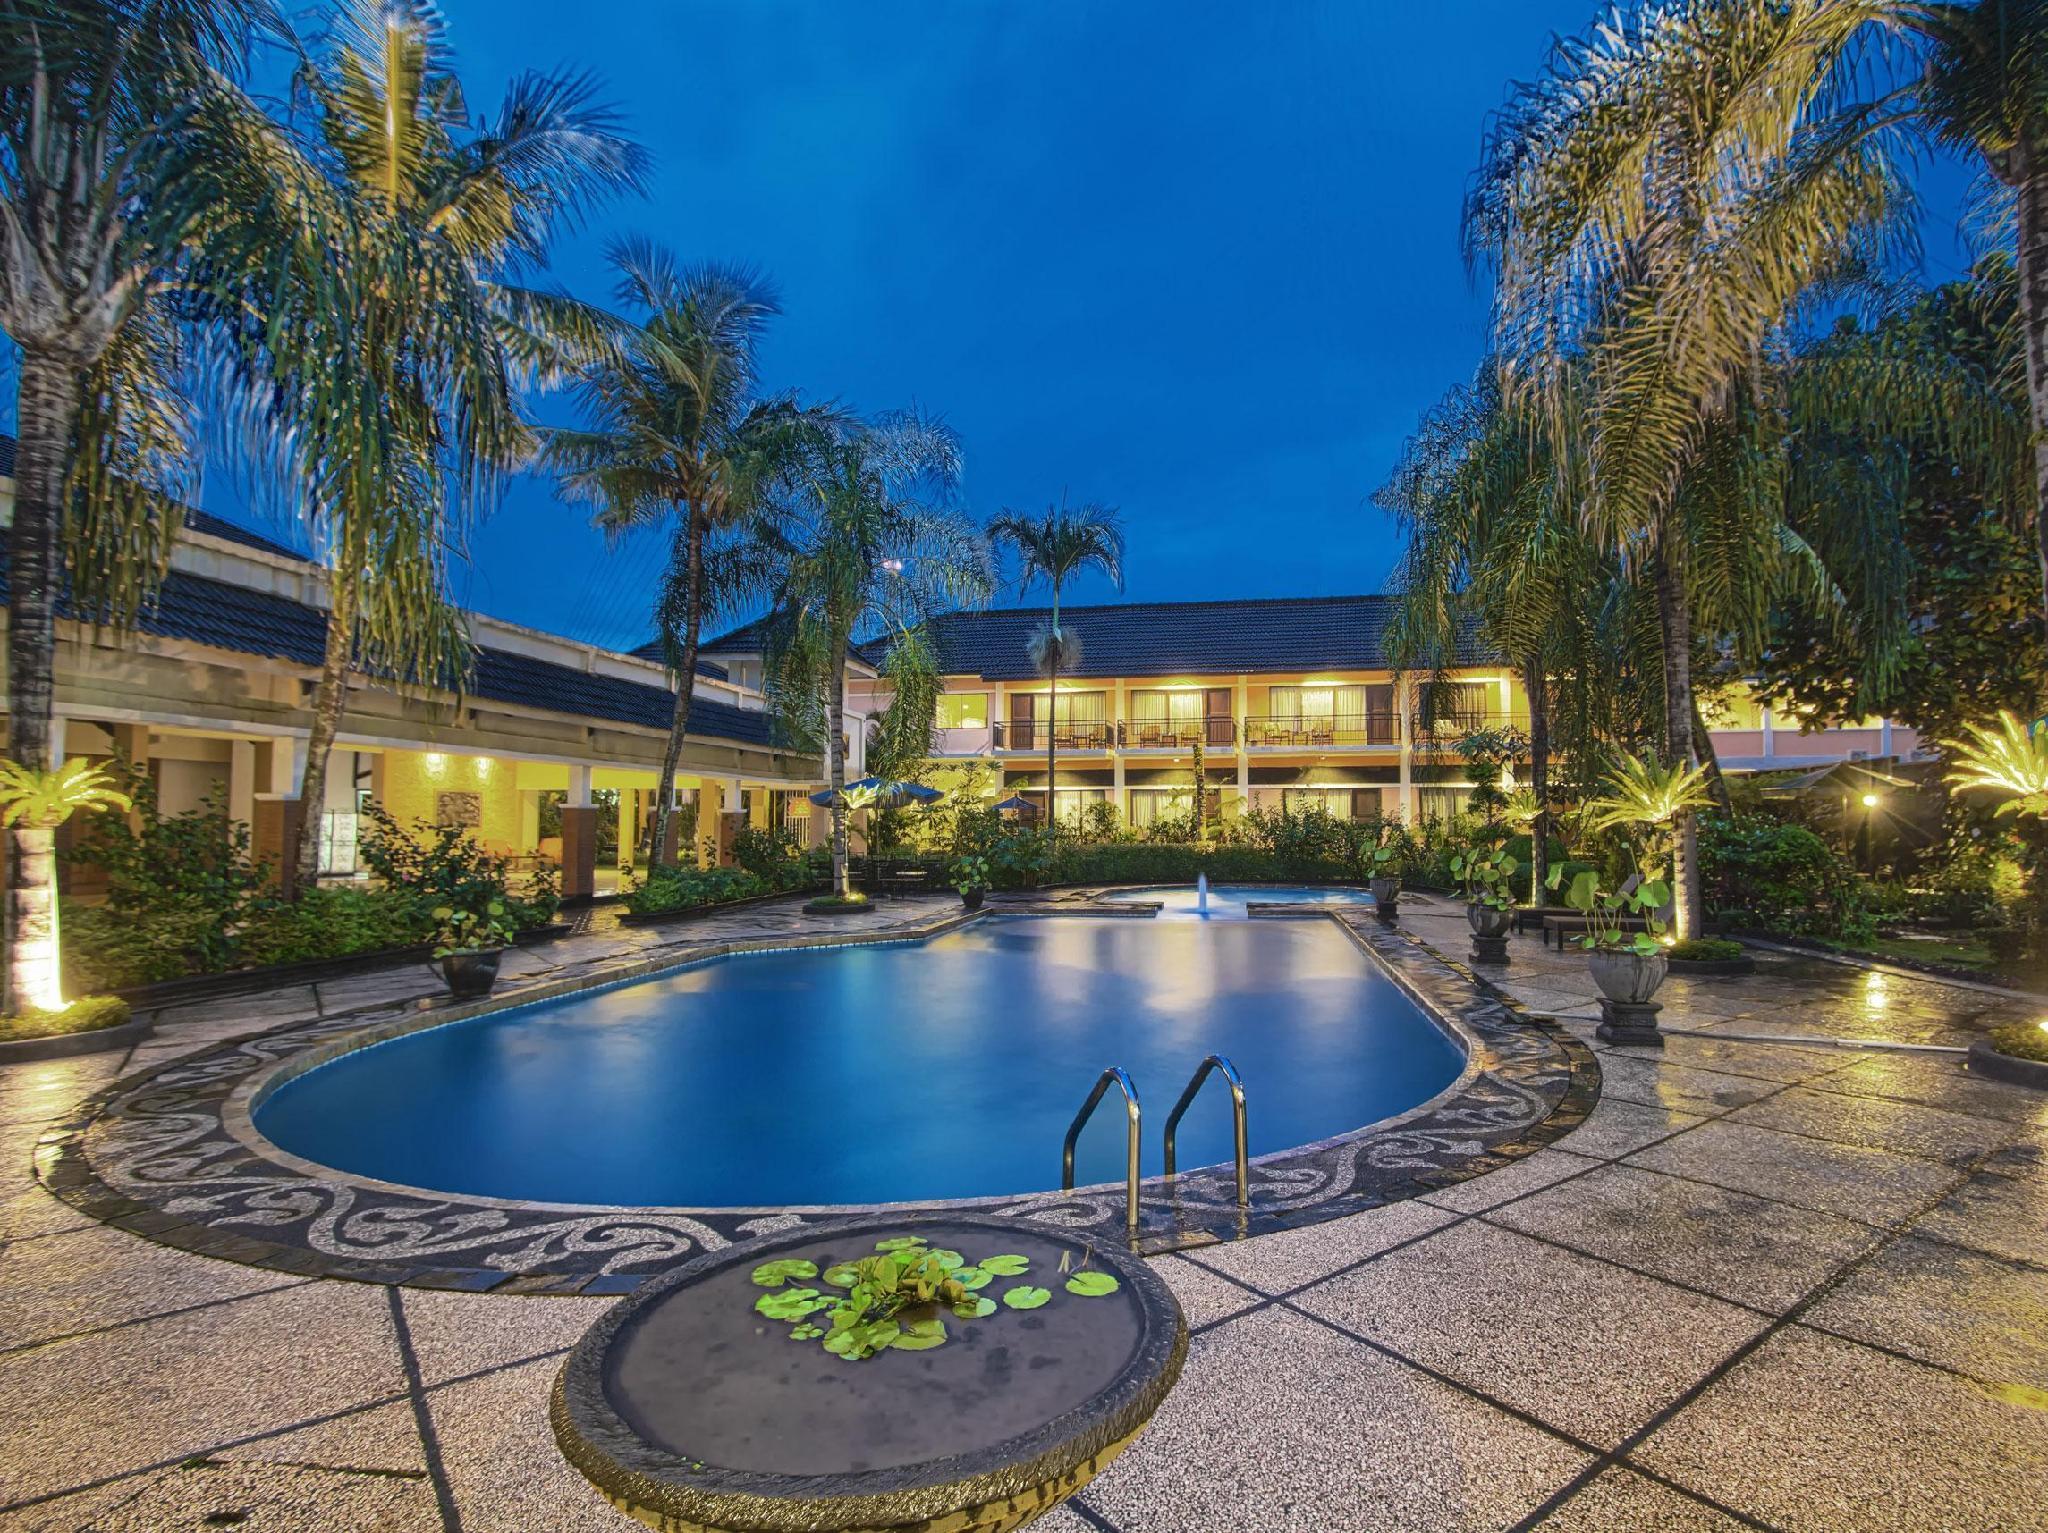 Sahid Montana Dua Hotel, Malang